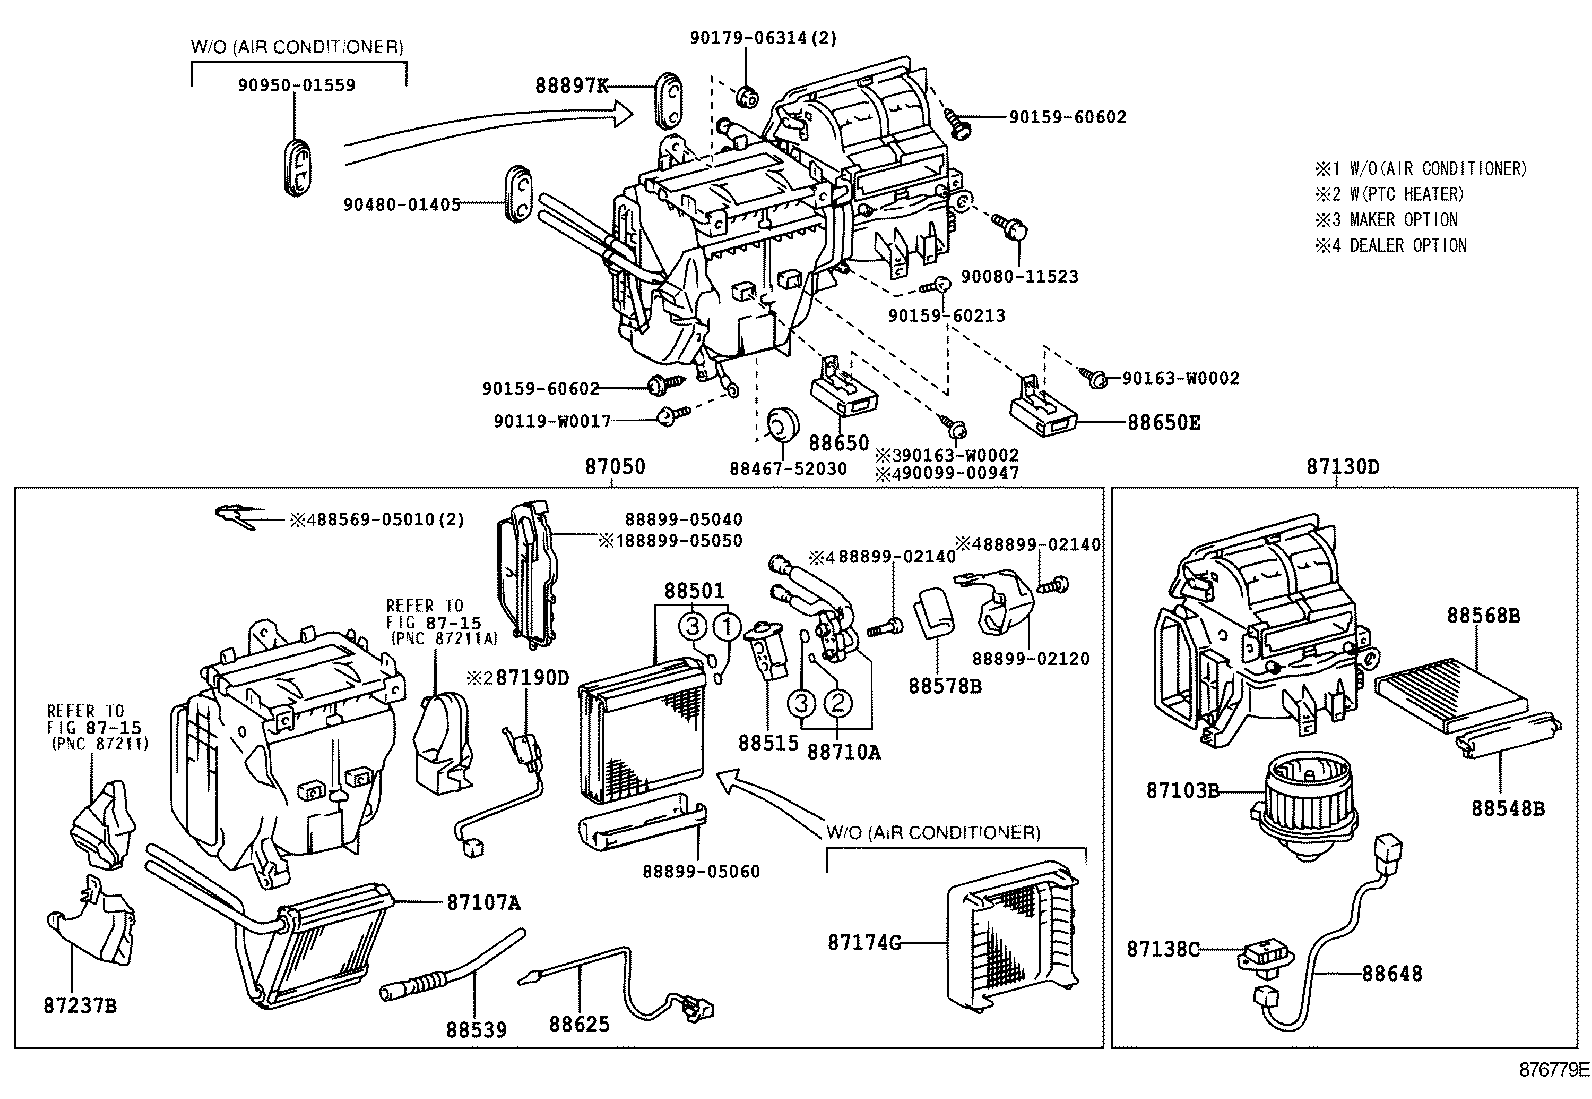 toyota corolla hb ukpnde120l-dhmdyw - electrical